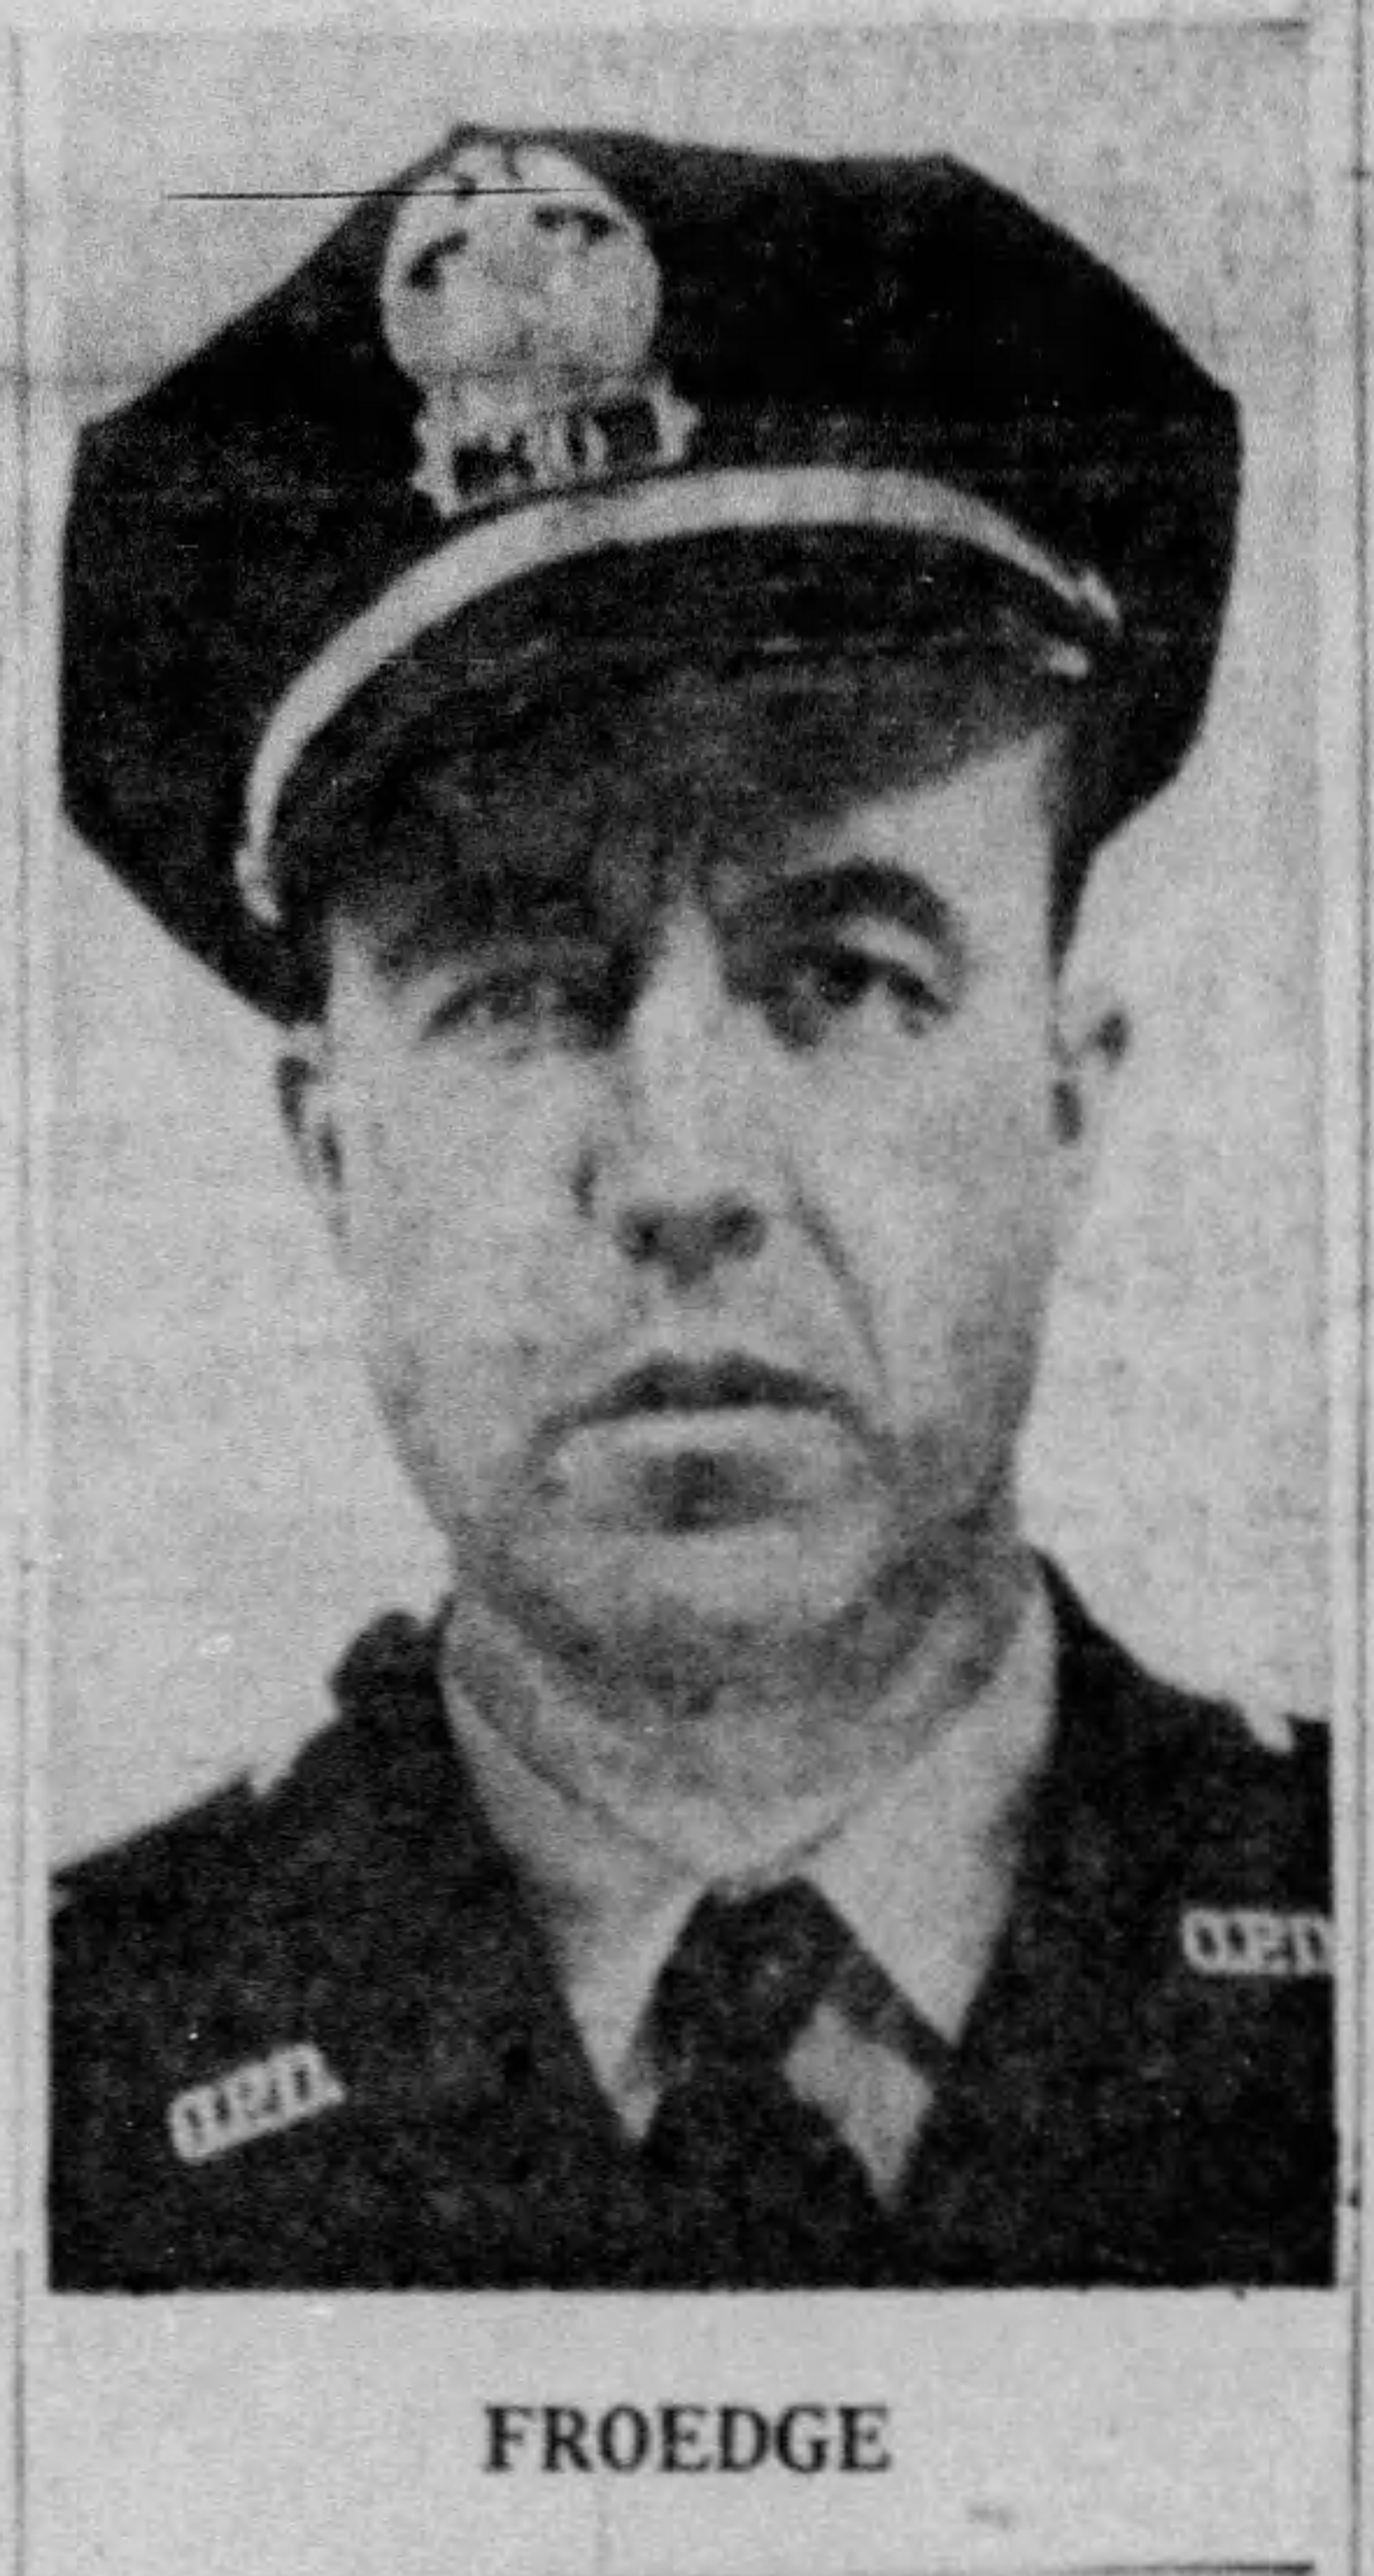 Patrolman Rufus Edward Froedge | Owensboro Police Department, Kentucky